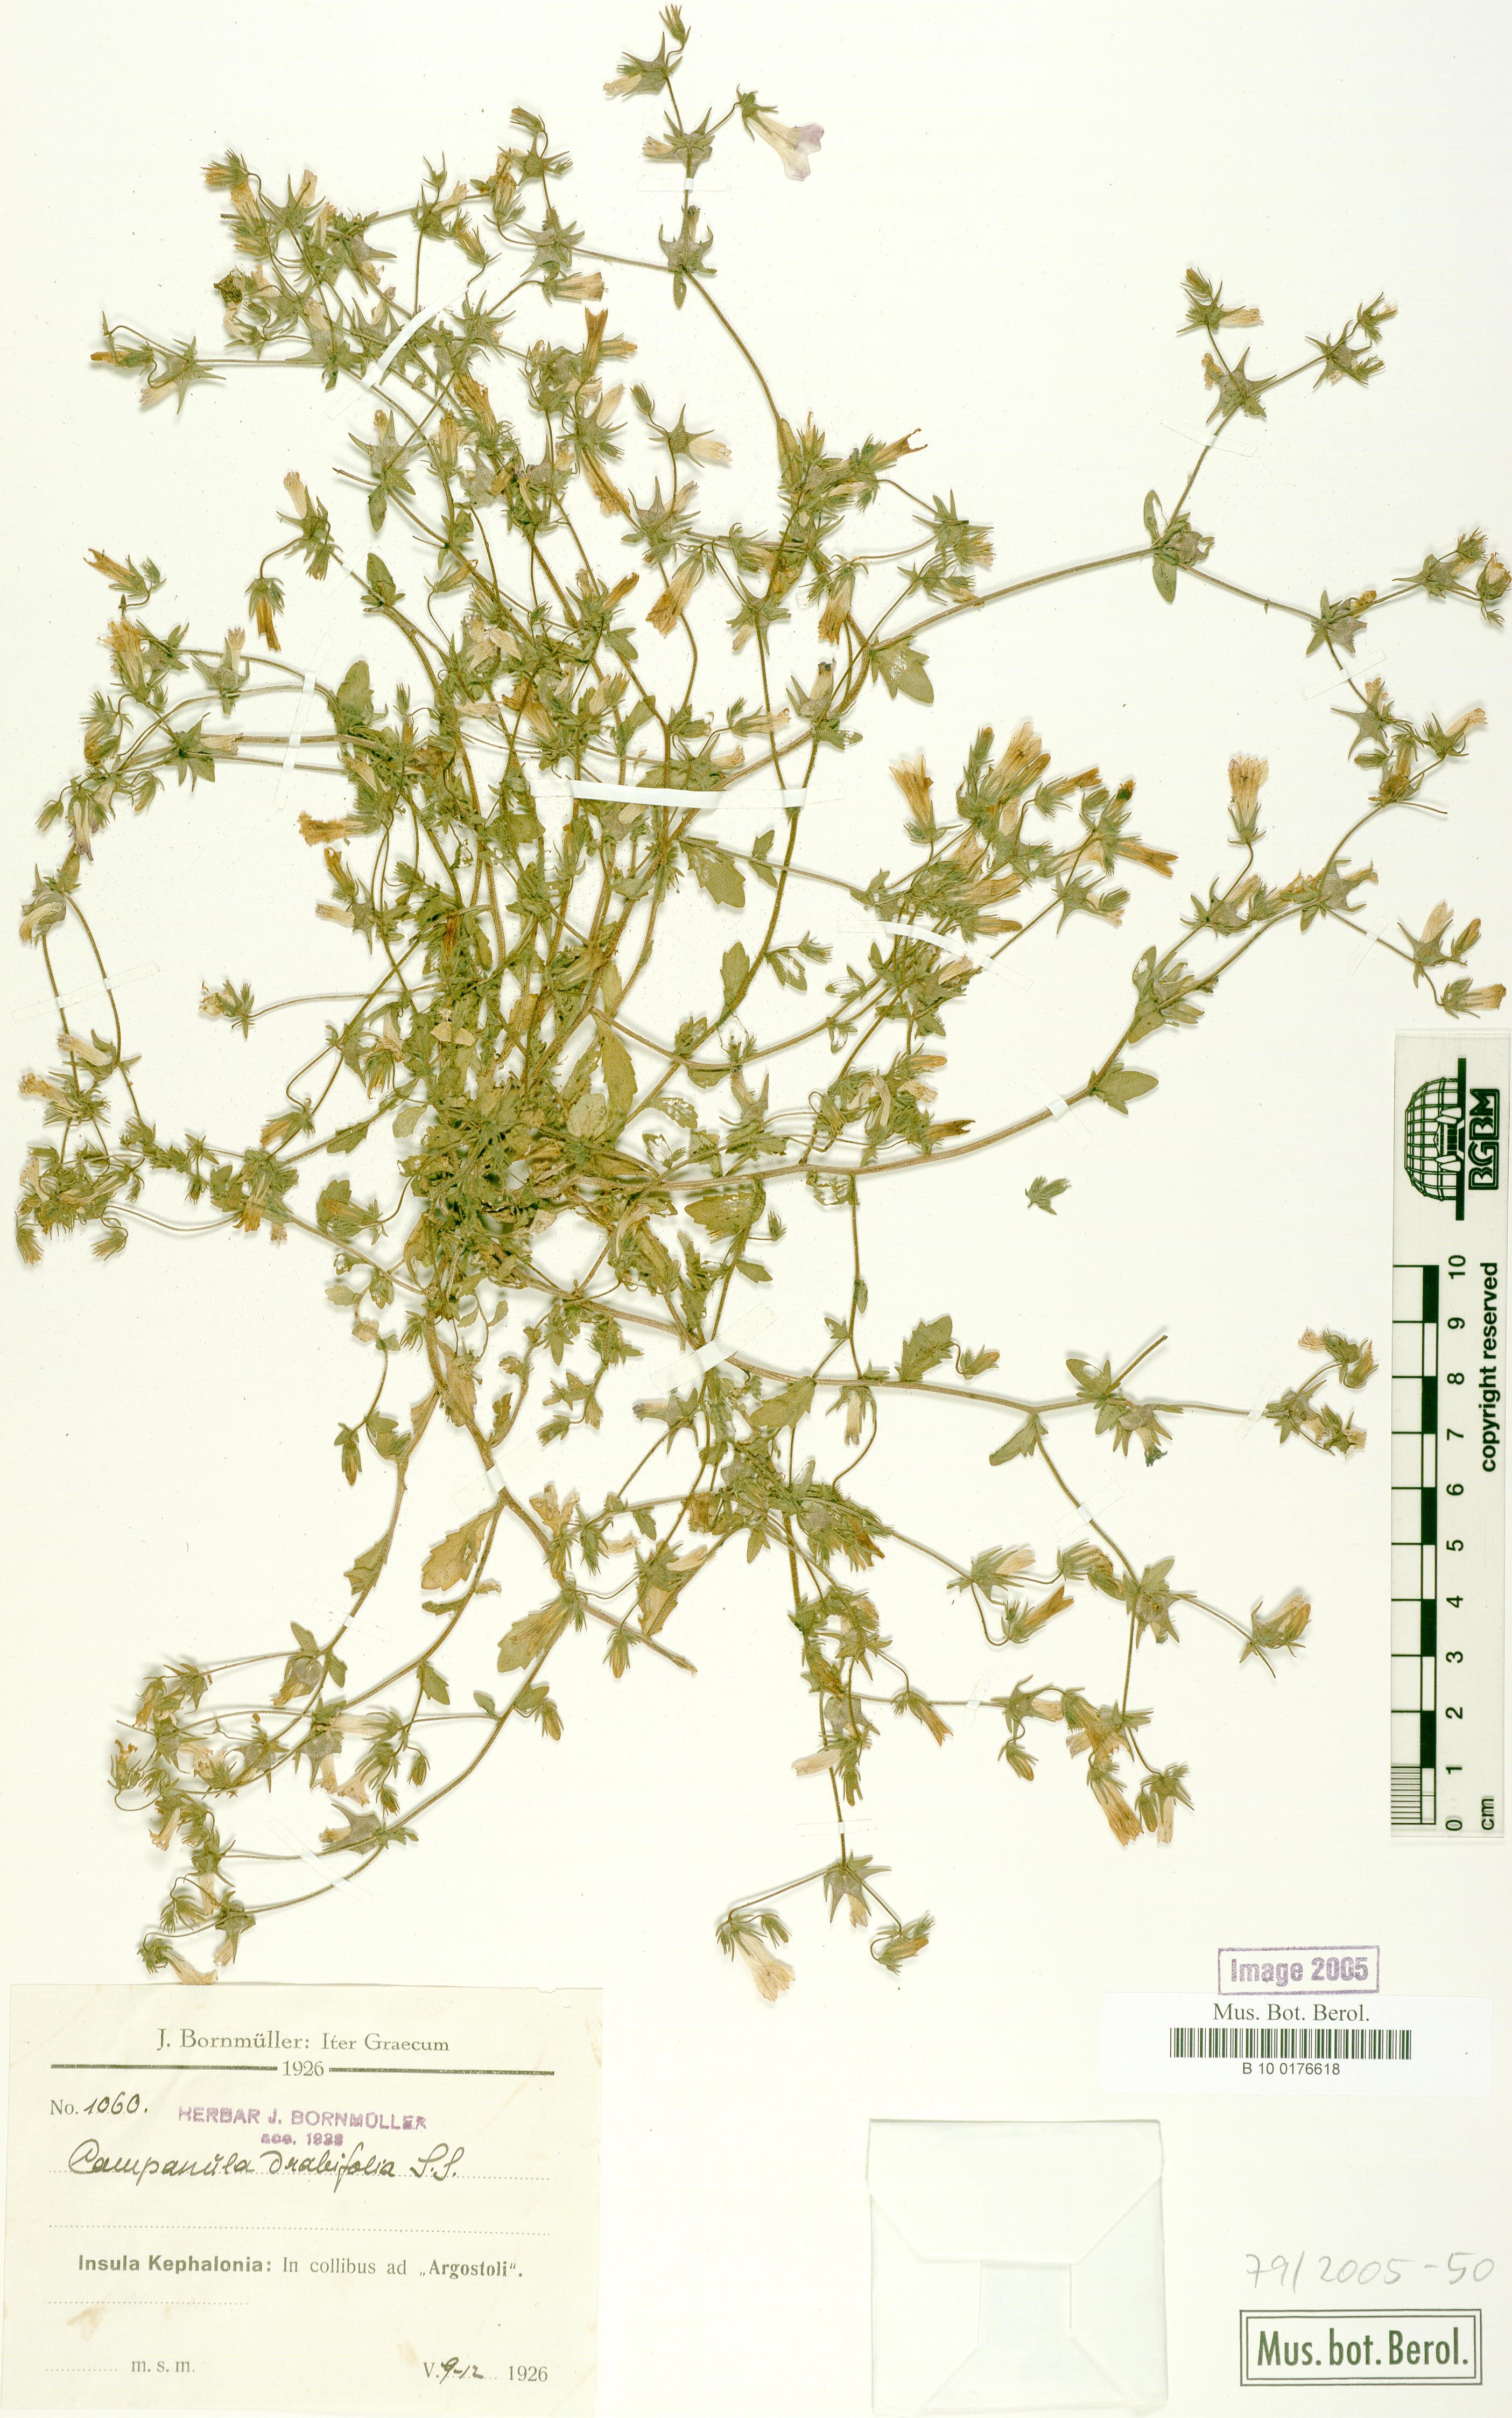 http://ww2.bgbm.org/herbarium/images/B/10/01/76/61/B_10_0176618.jpg